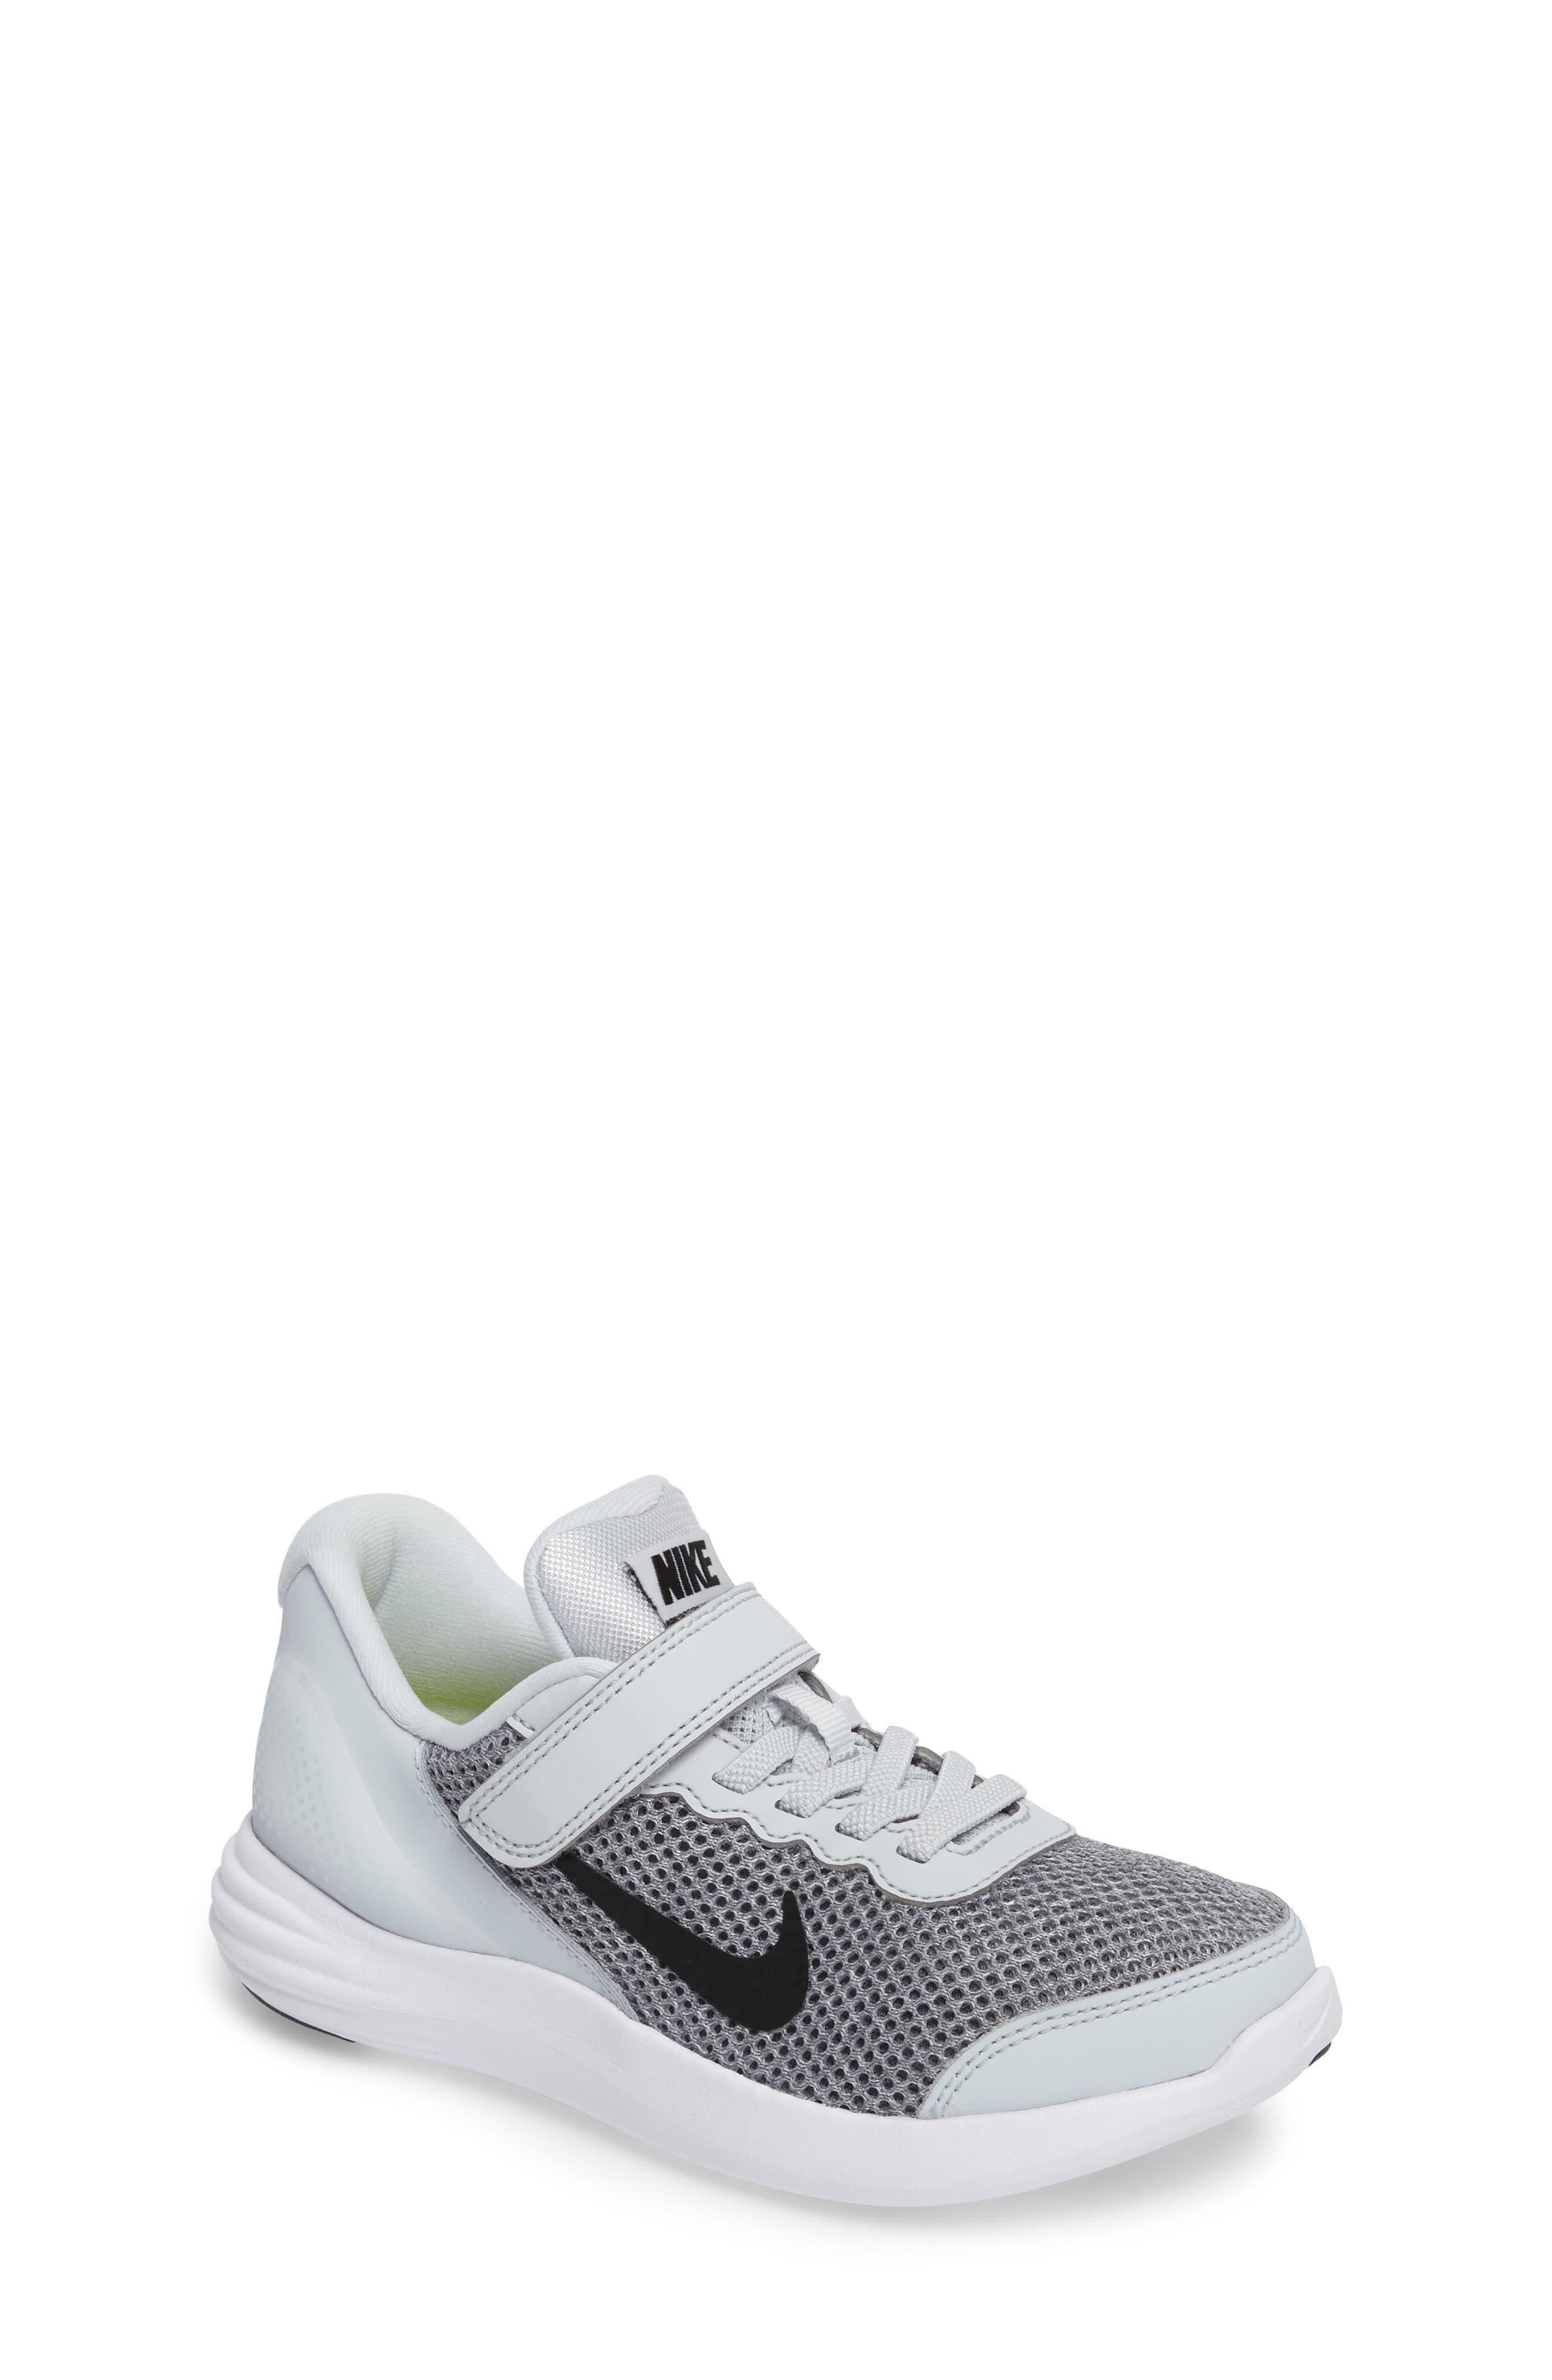 Nike Lunar Apparent Sneaker (Toddler & Little Kid)